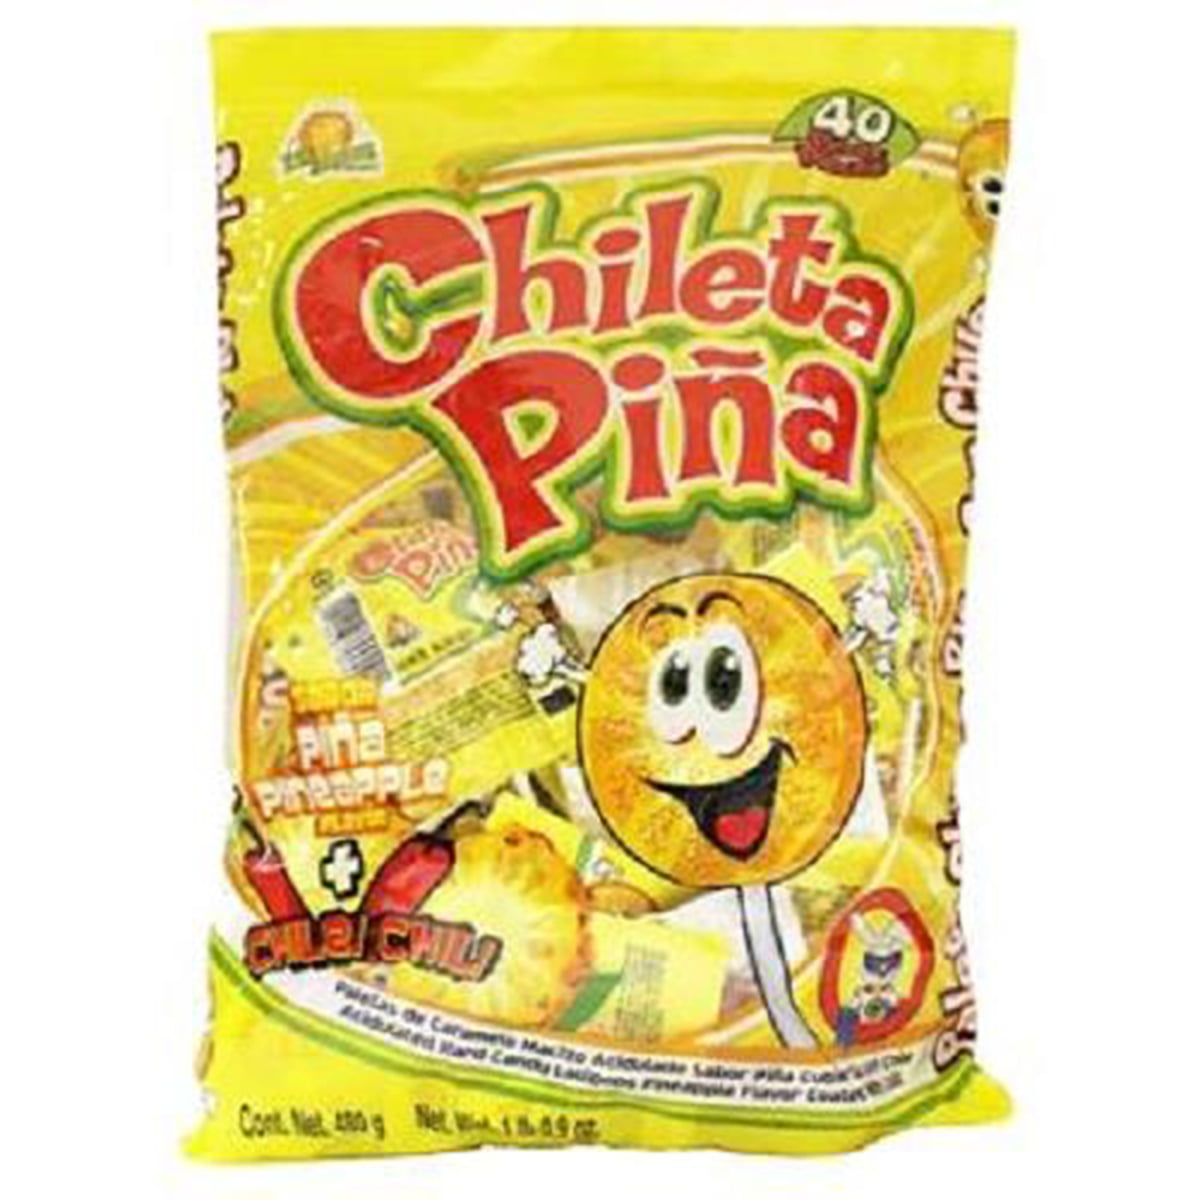 El Azteca Chileta Pina, Chile Pineapple Lollipops, Bag of 40 by